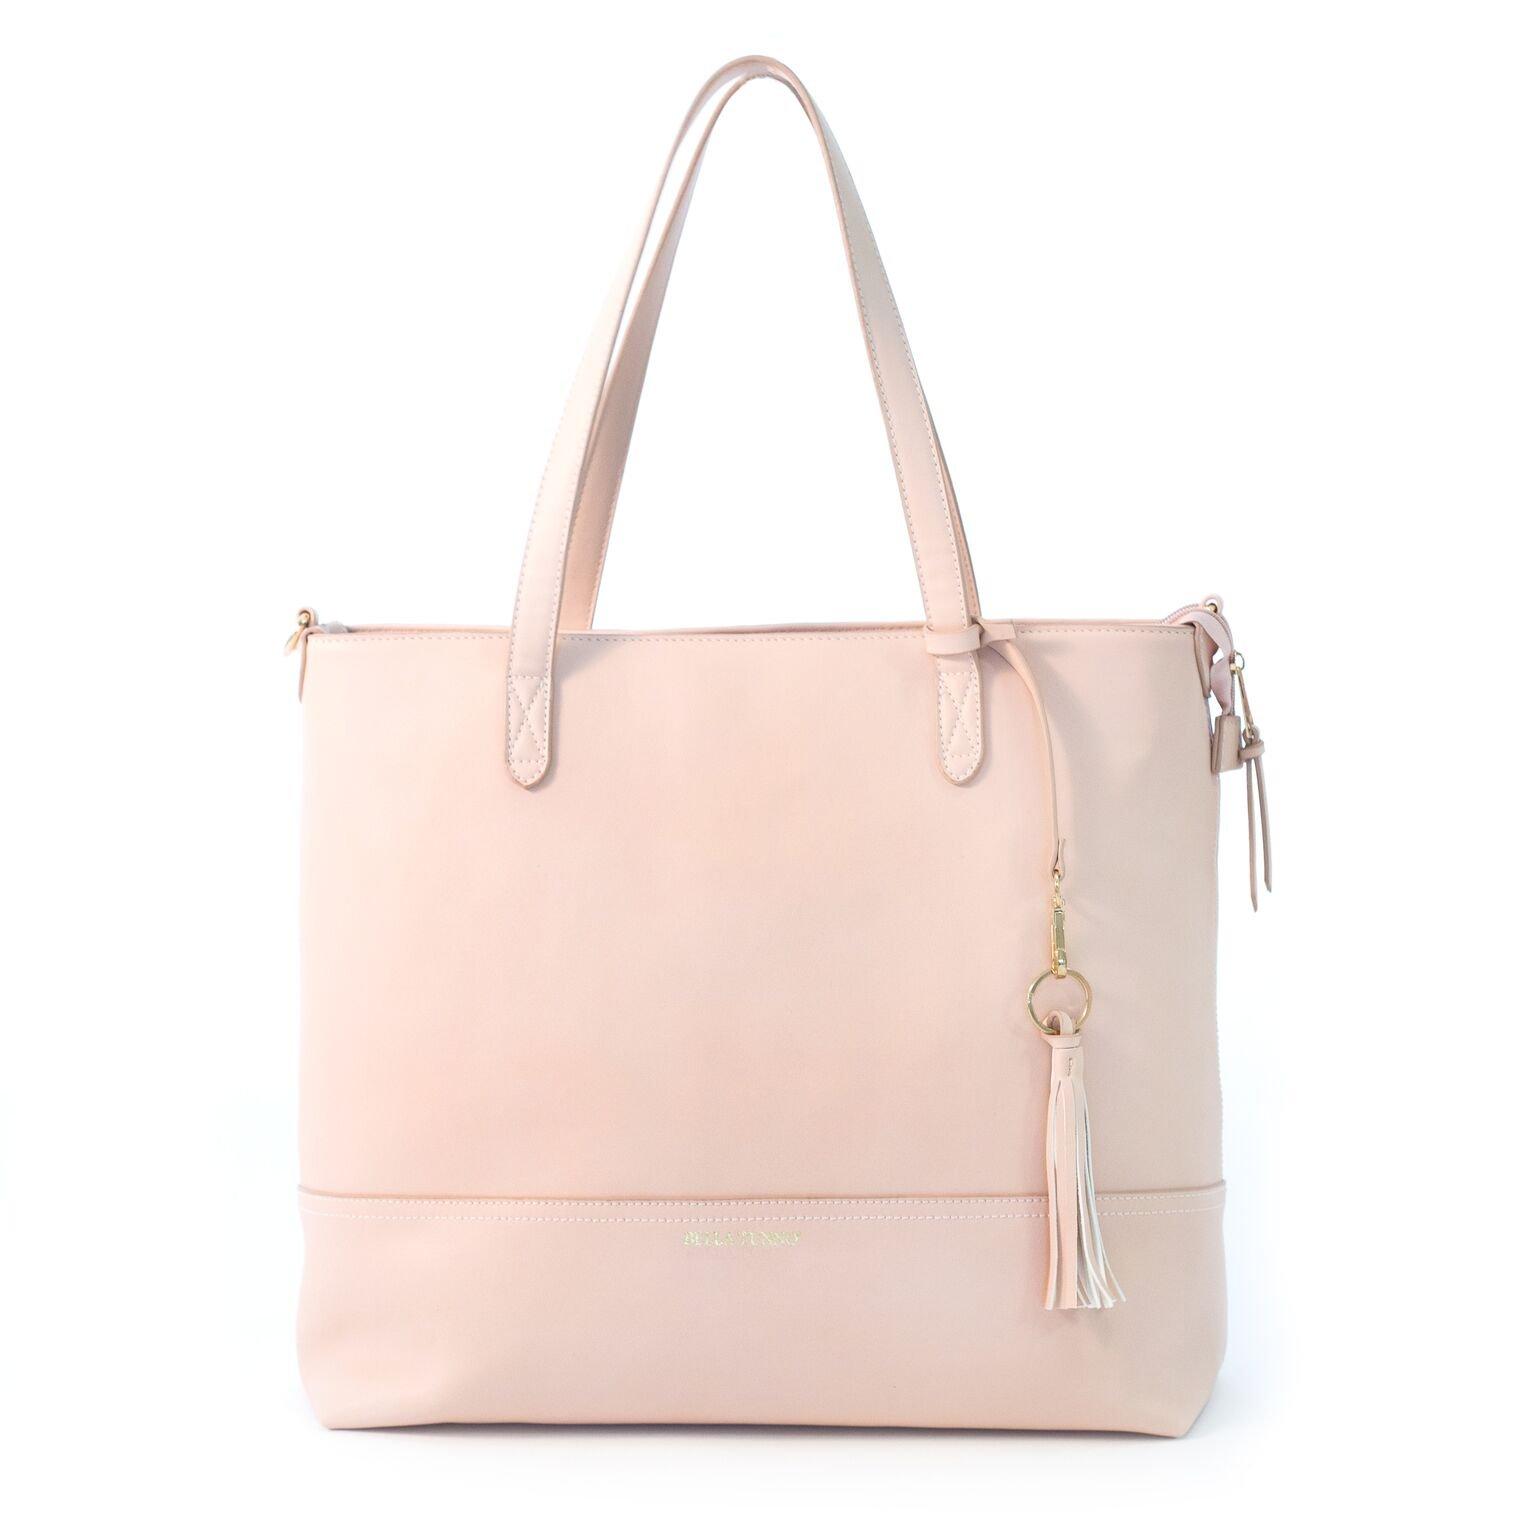 Bella Tunno Boss Bag Tote, Blush